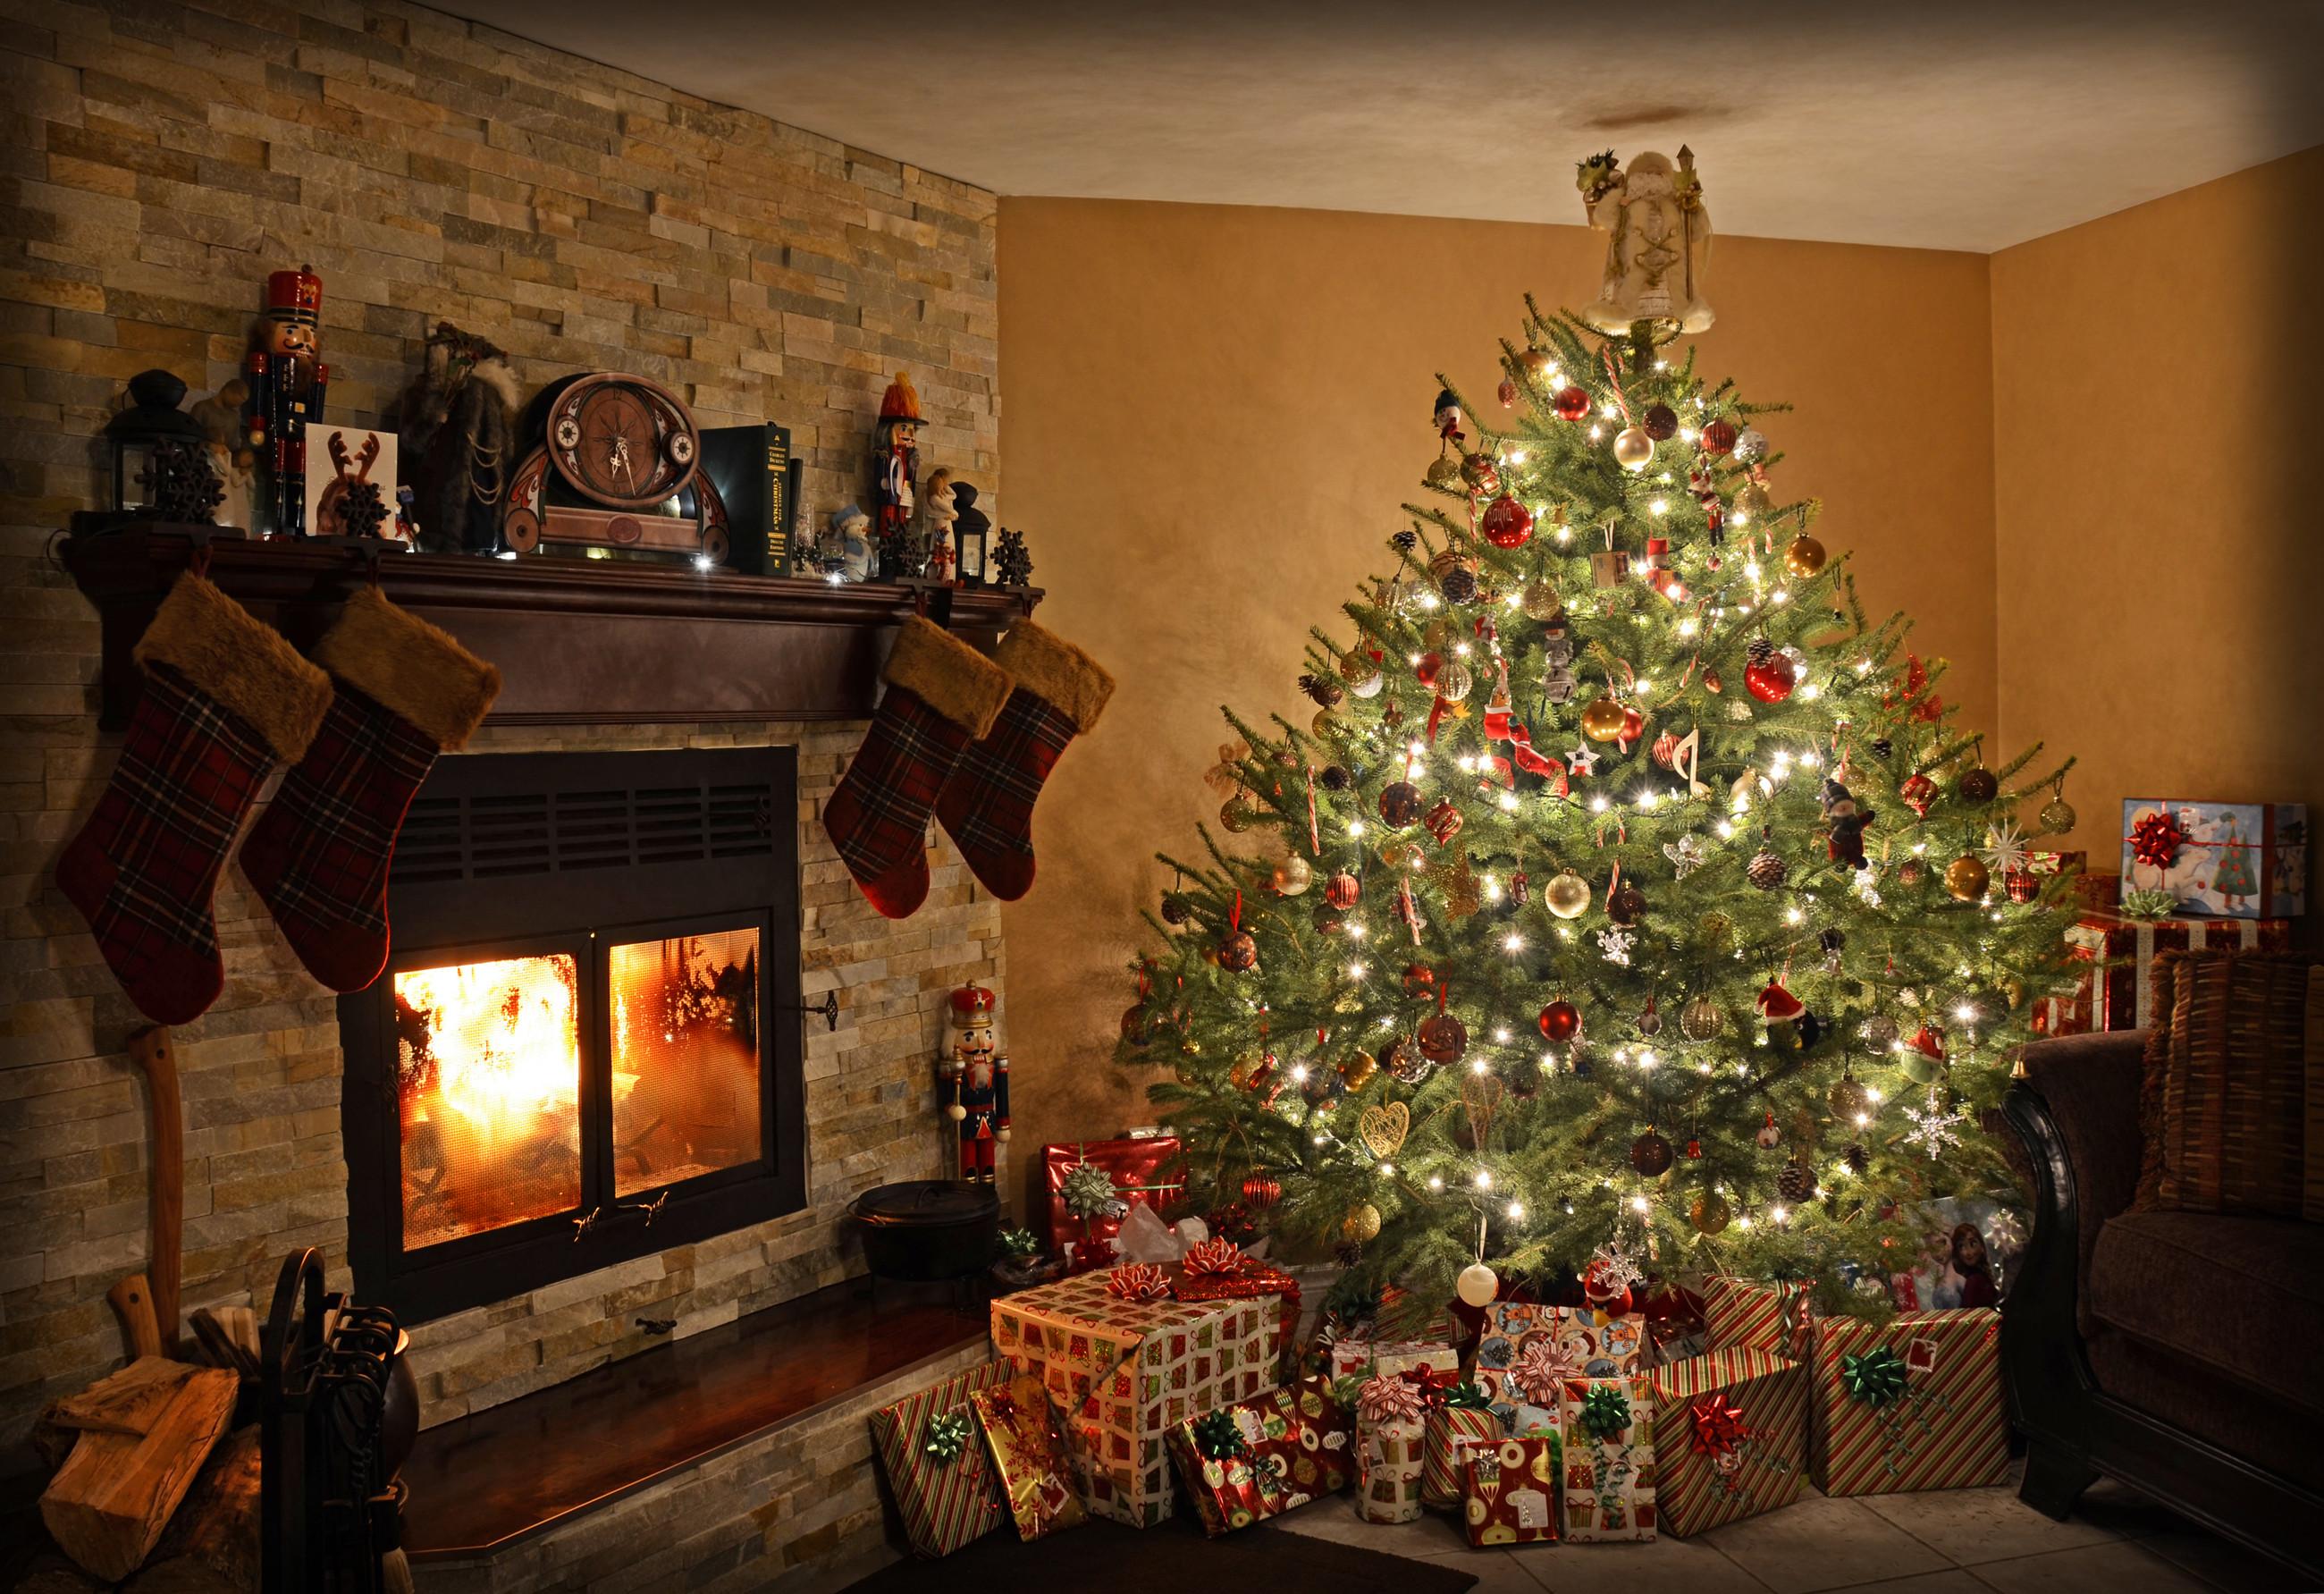 Res: 2600x1783, Christmas HD Wallpaper